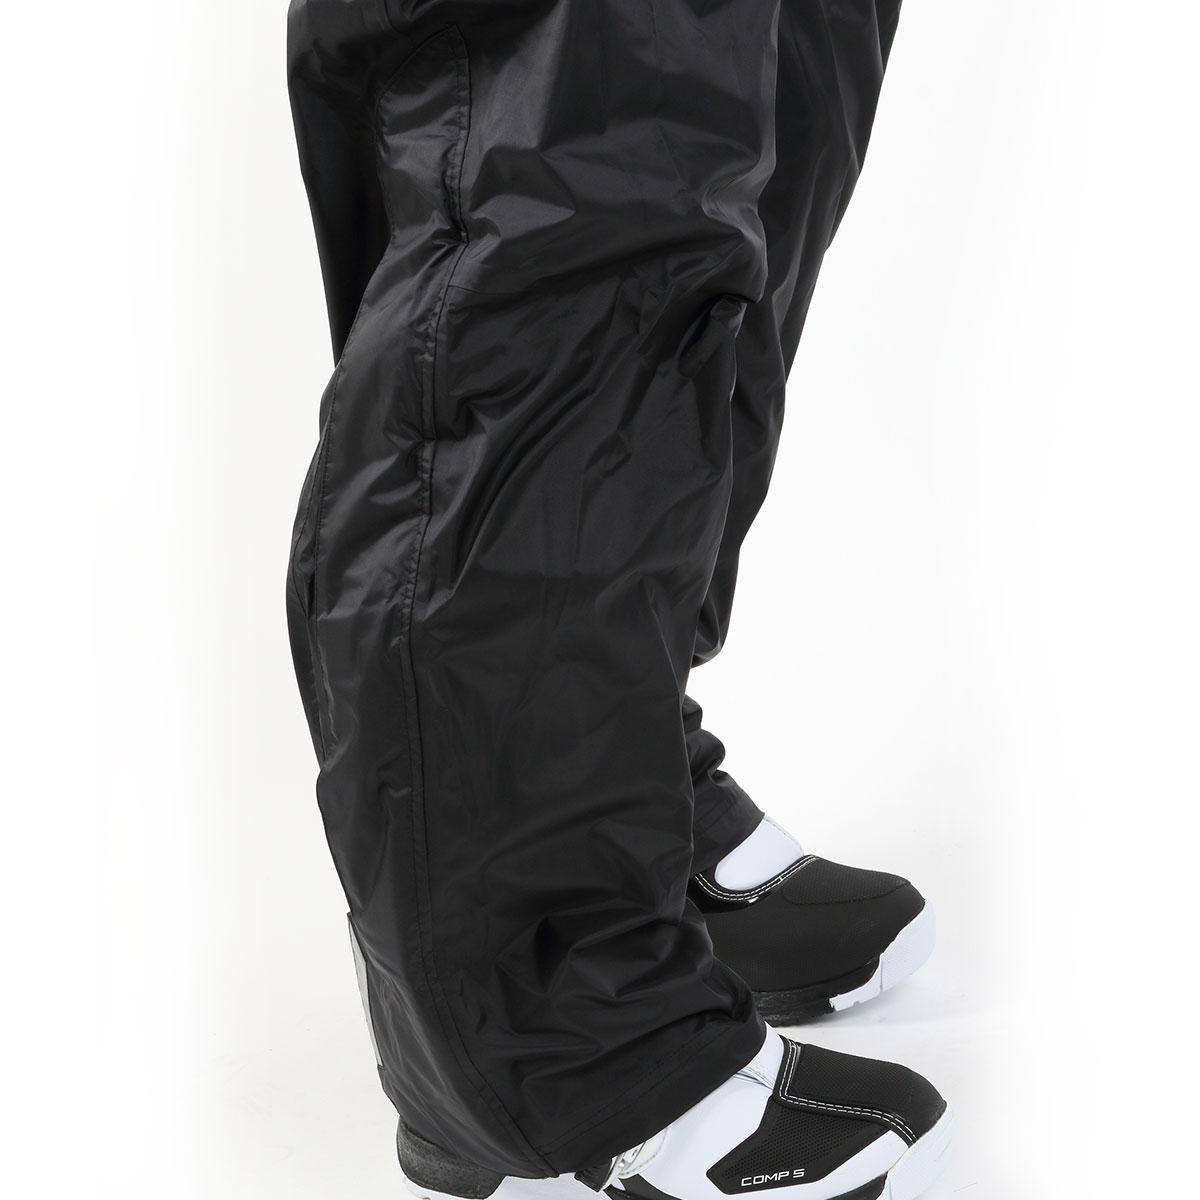 MONSOON OFF-ROAD RAIN PANTS